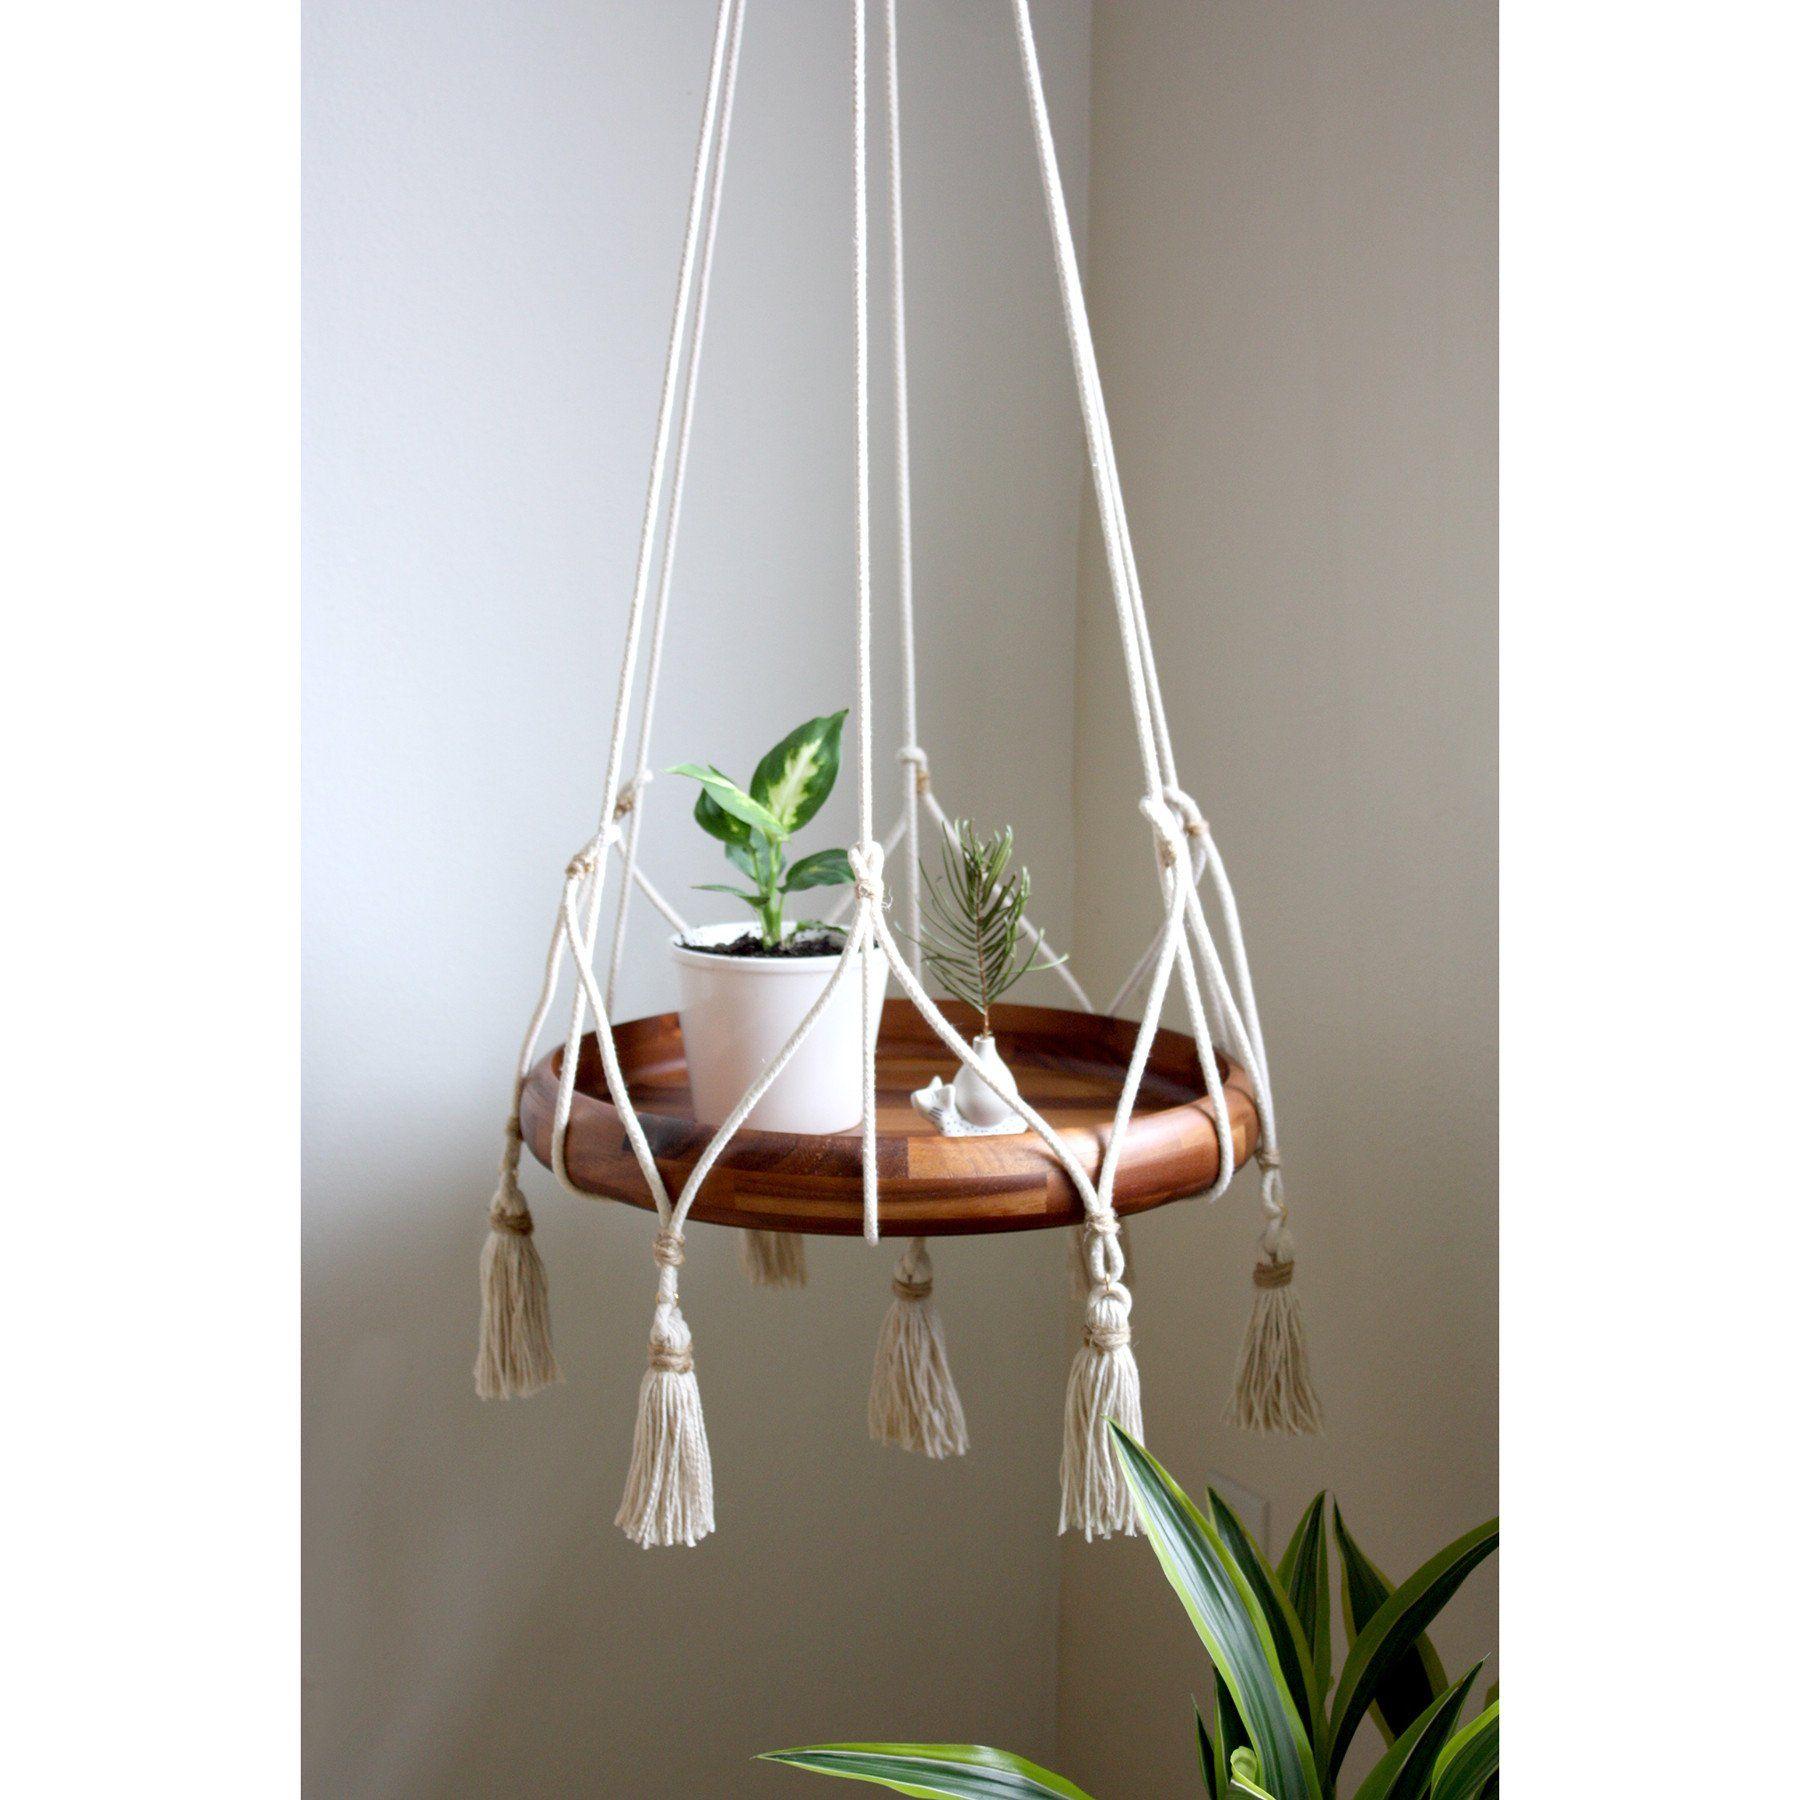 hanging table plant holder with tassels cotton jute wishlist pinterest macrame diy. Black Bedroom Furniture Sets. Home Design Ideas